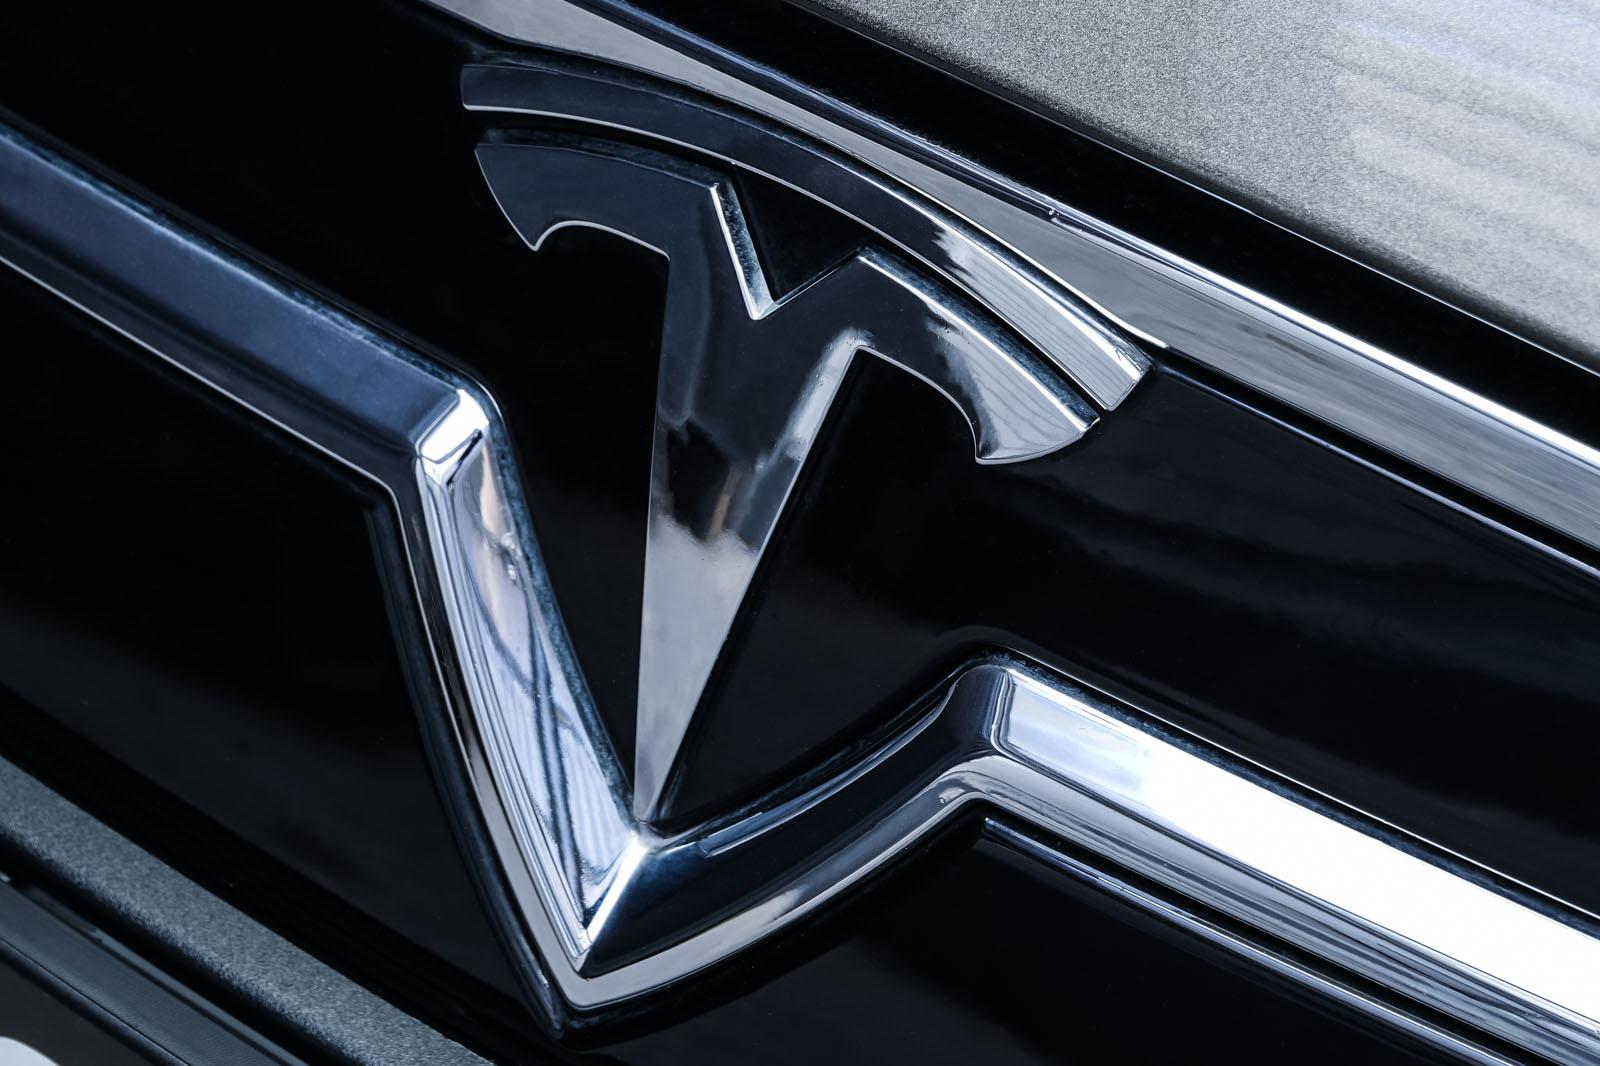 Tesla_ModelS85D_TitaniumMetallic_Beige_Tes-2897_12_w